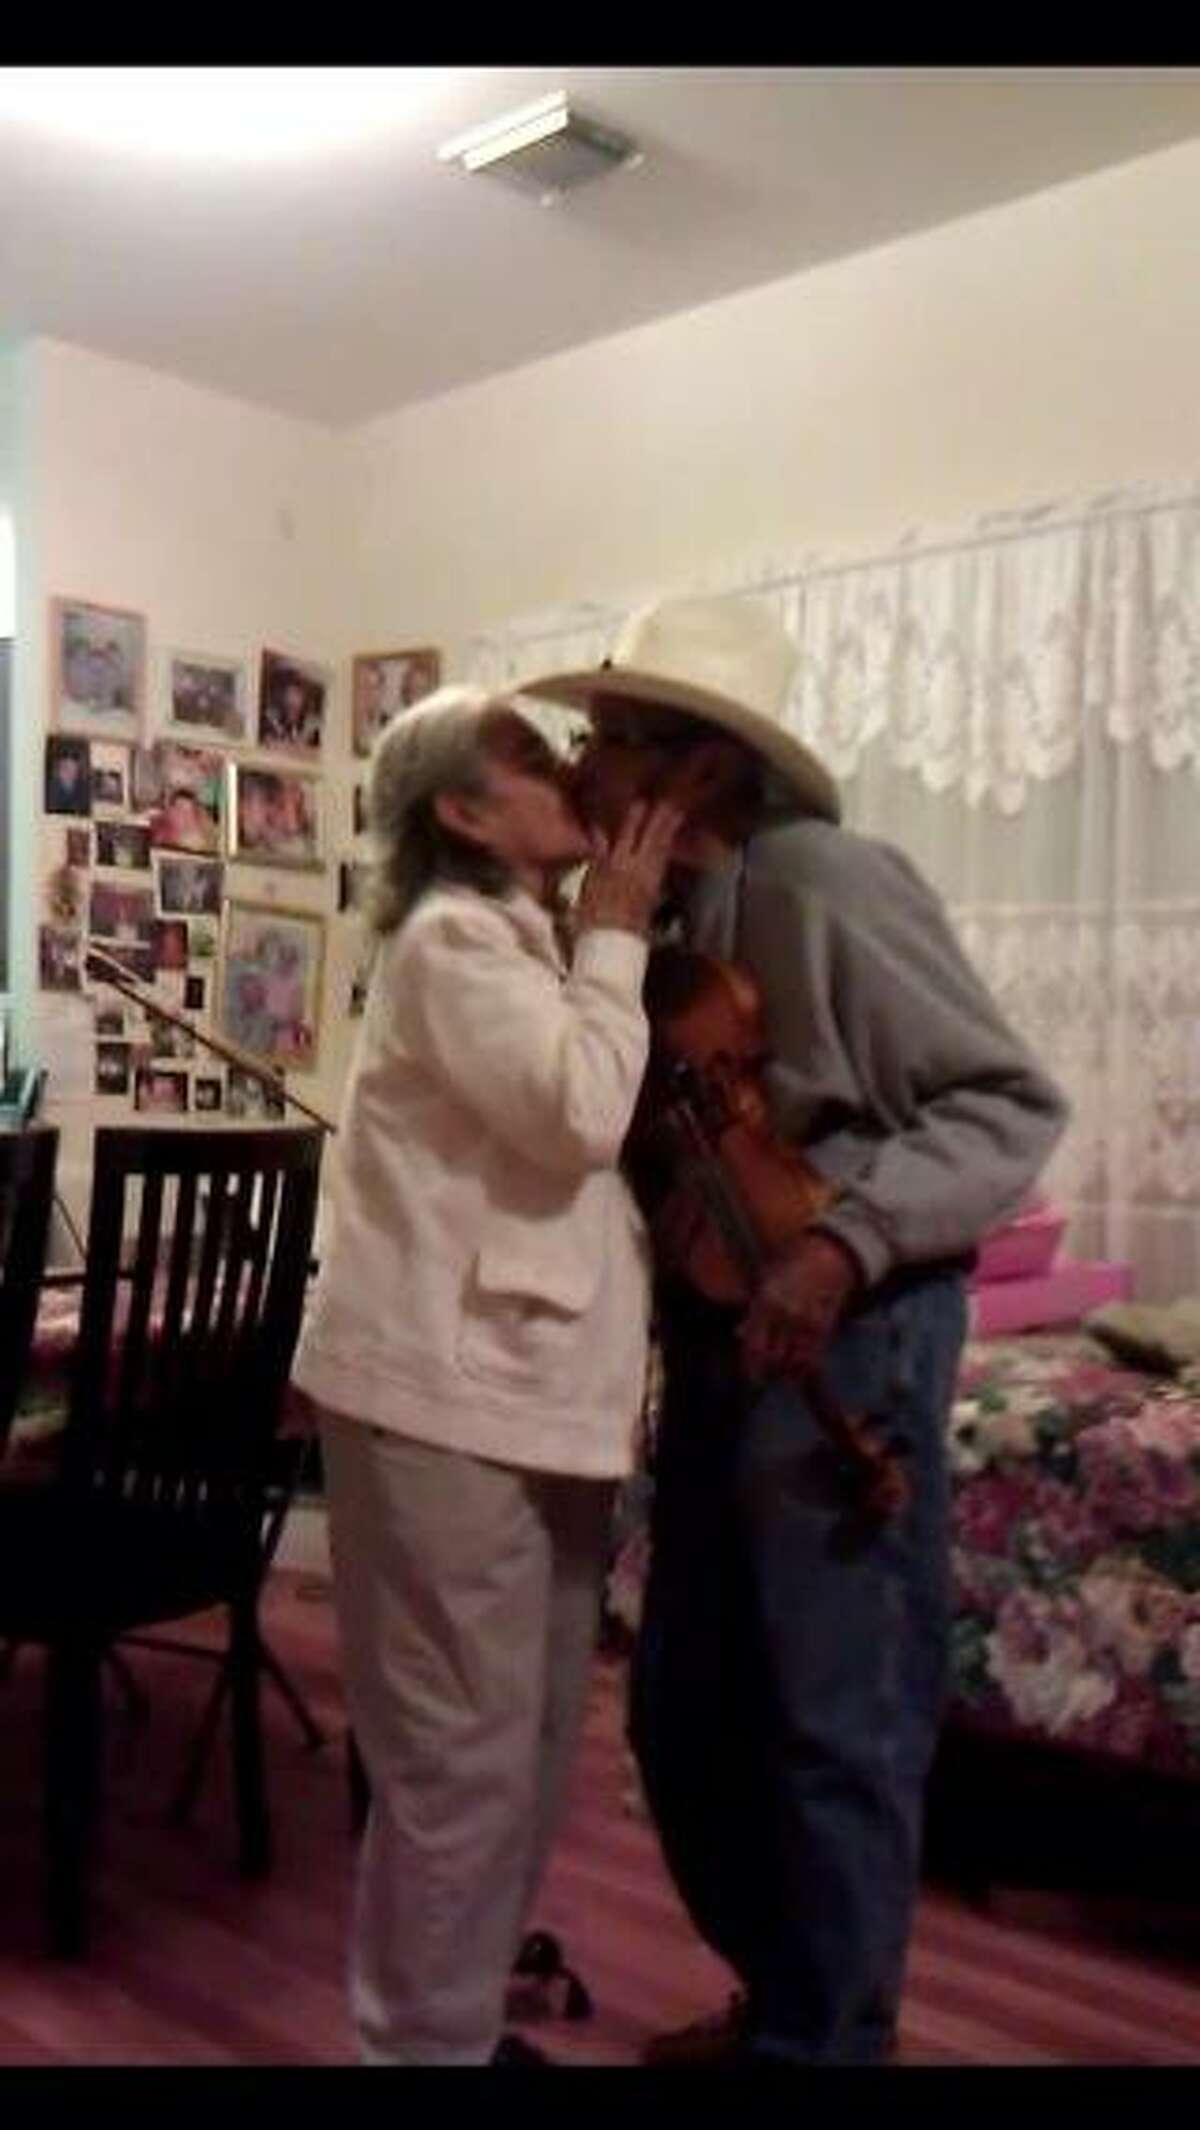 Cruz and his wife Emilia (Courtesy of Cruz Family)